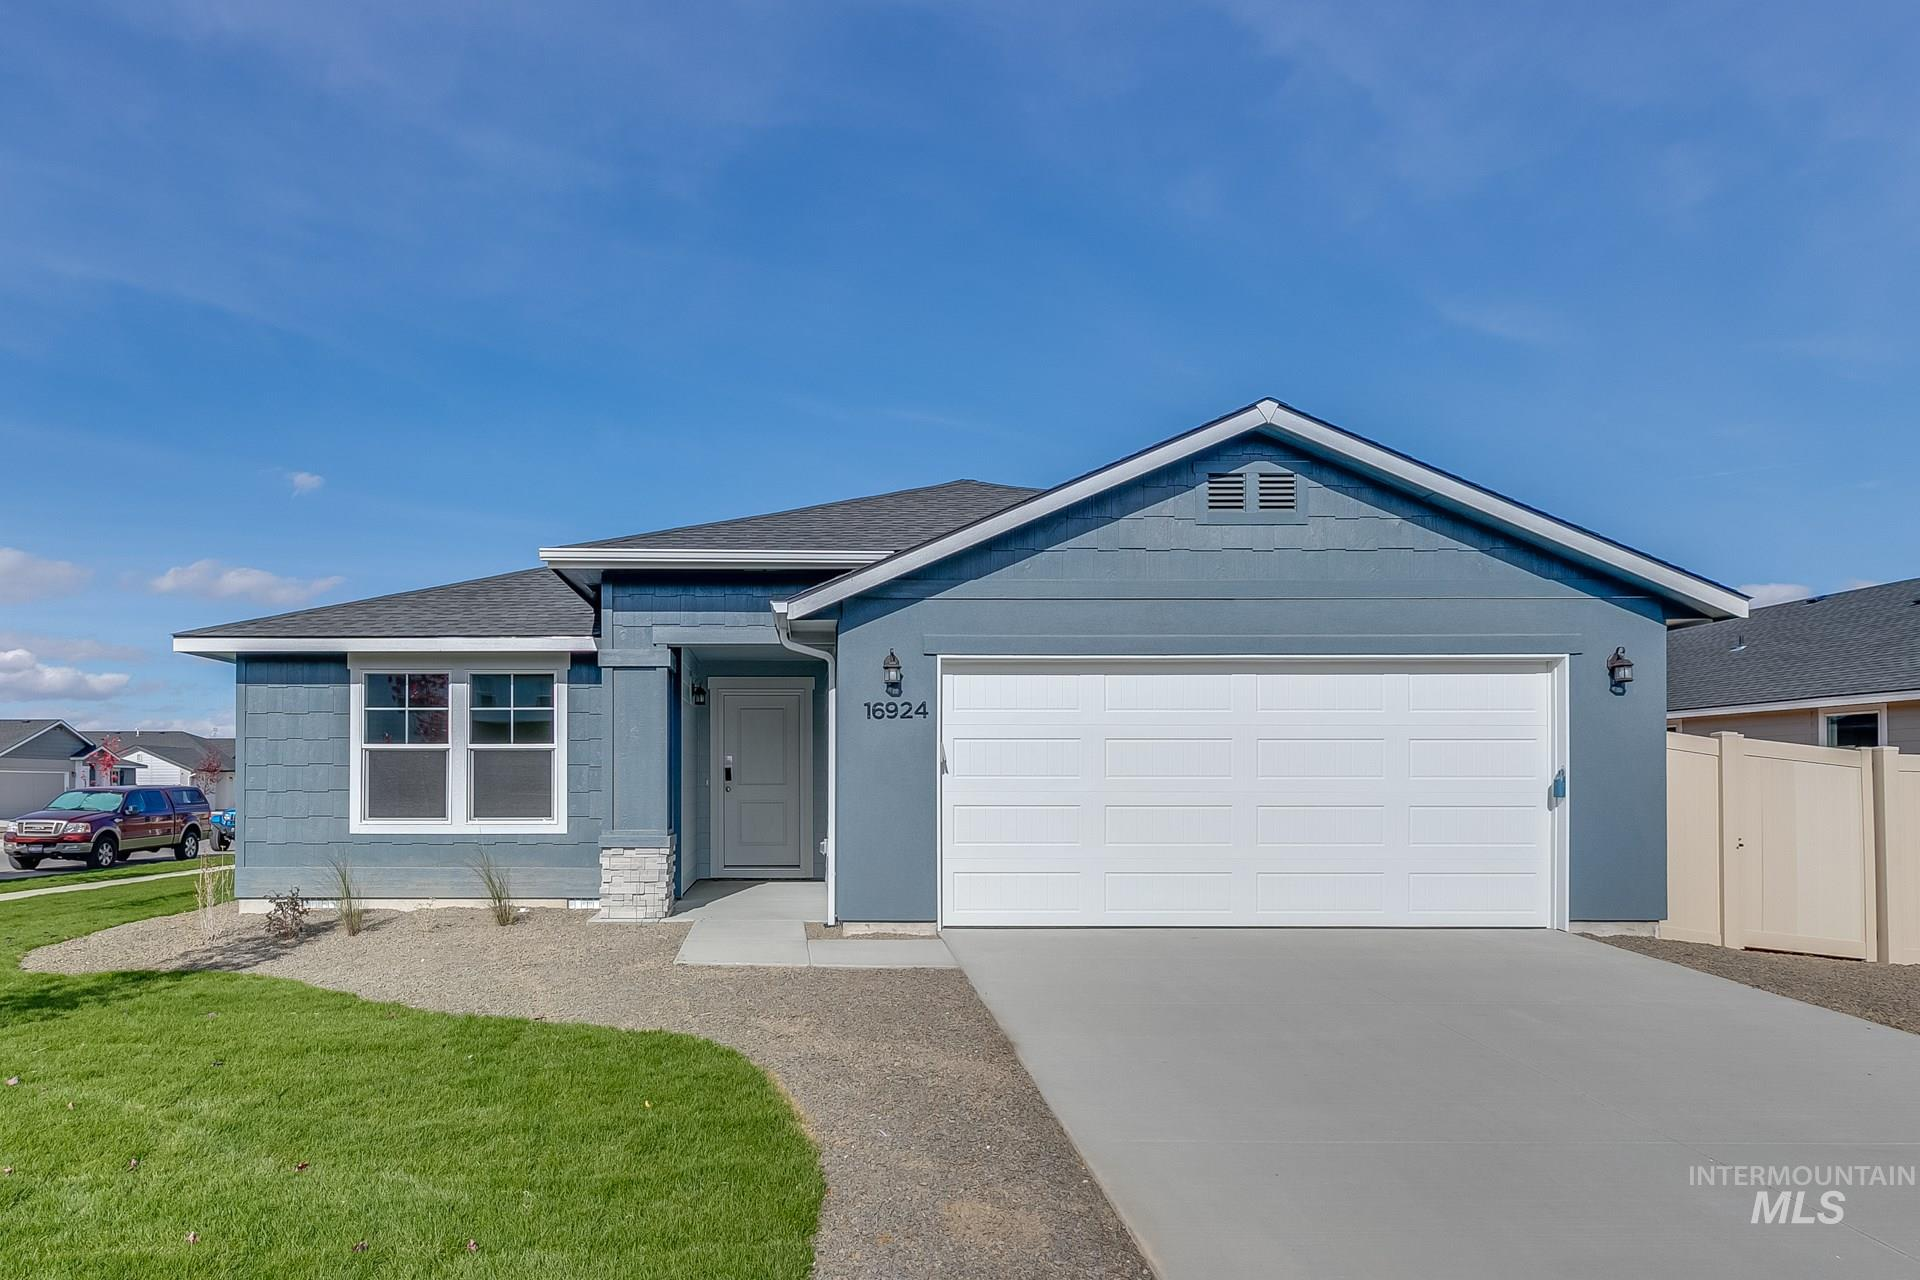 2759 W Balboa Dr Property Photo - Kuna, ID real estate listing